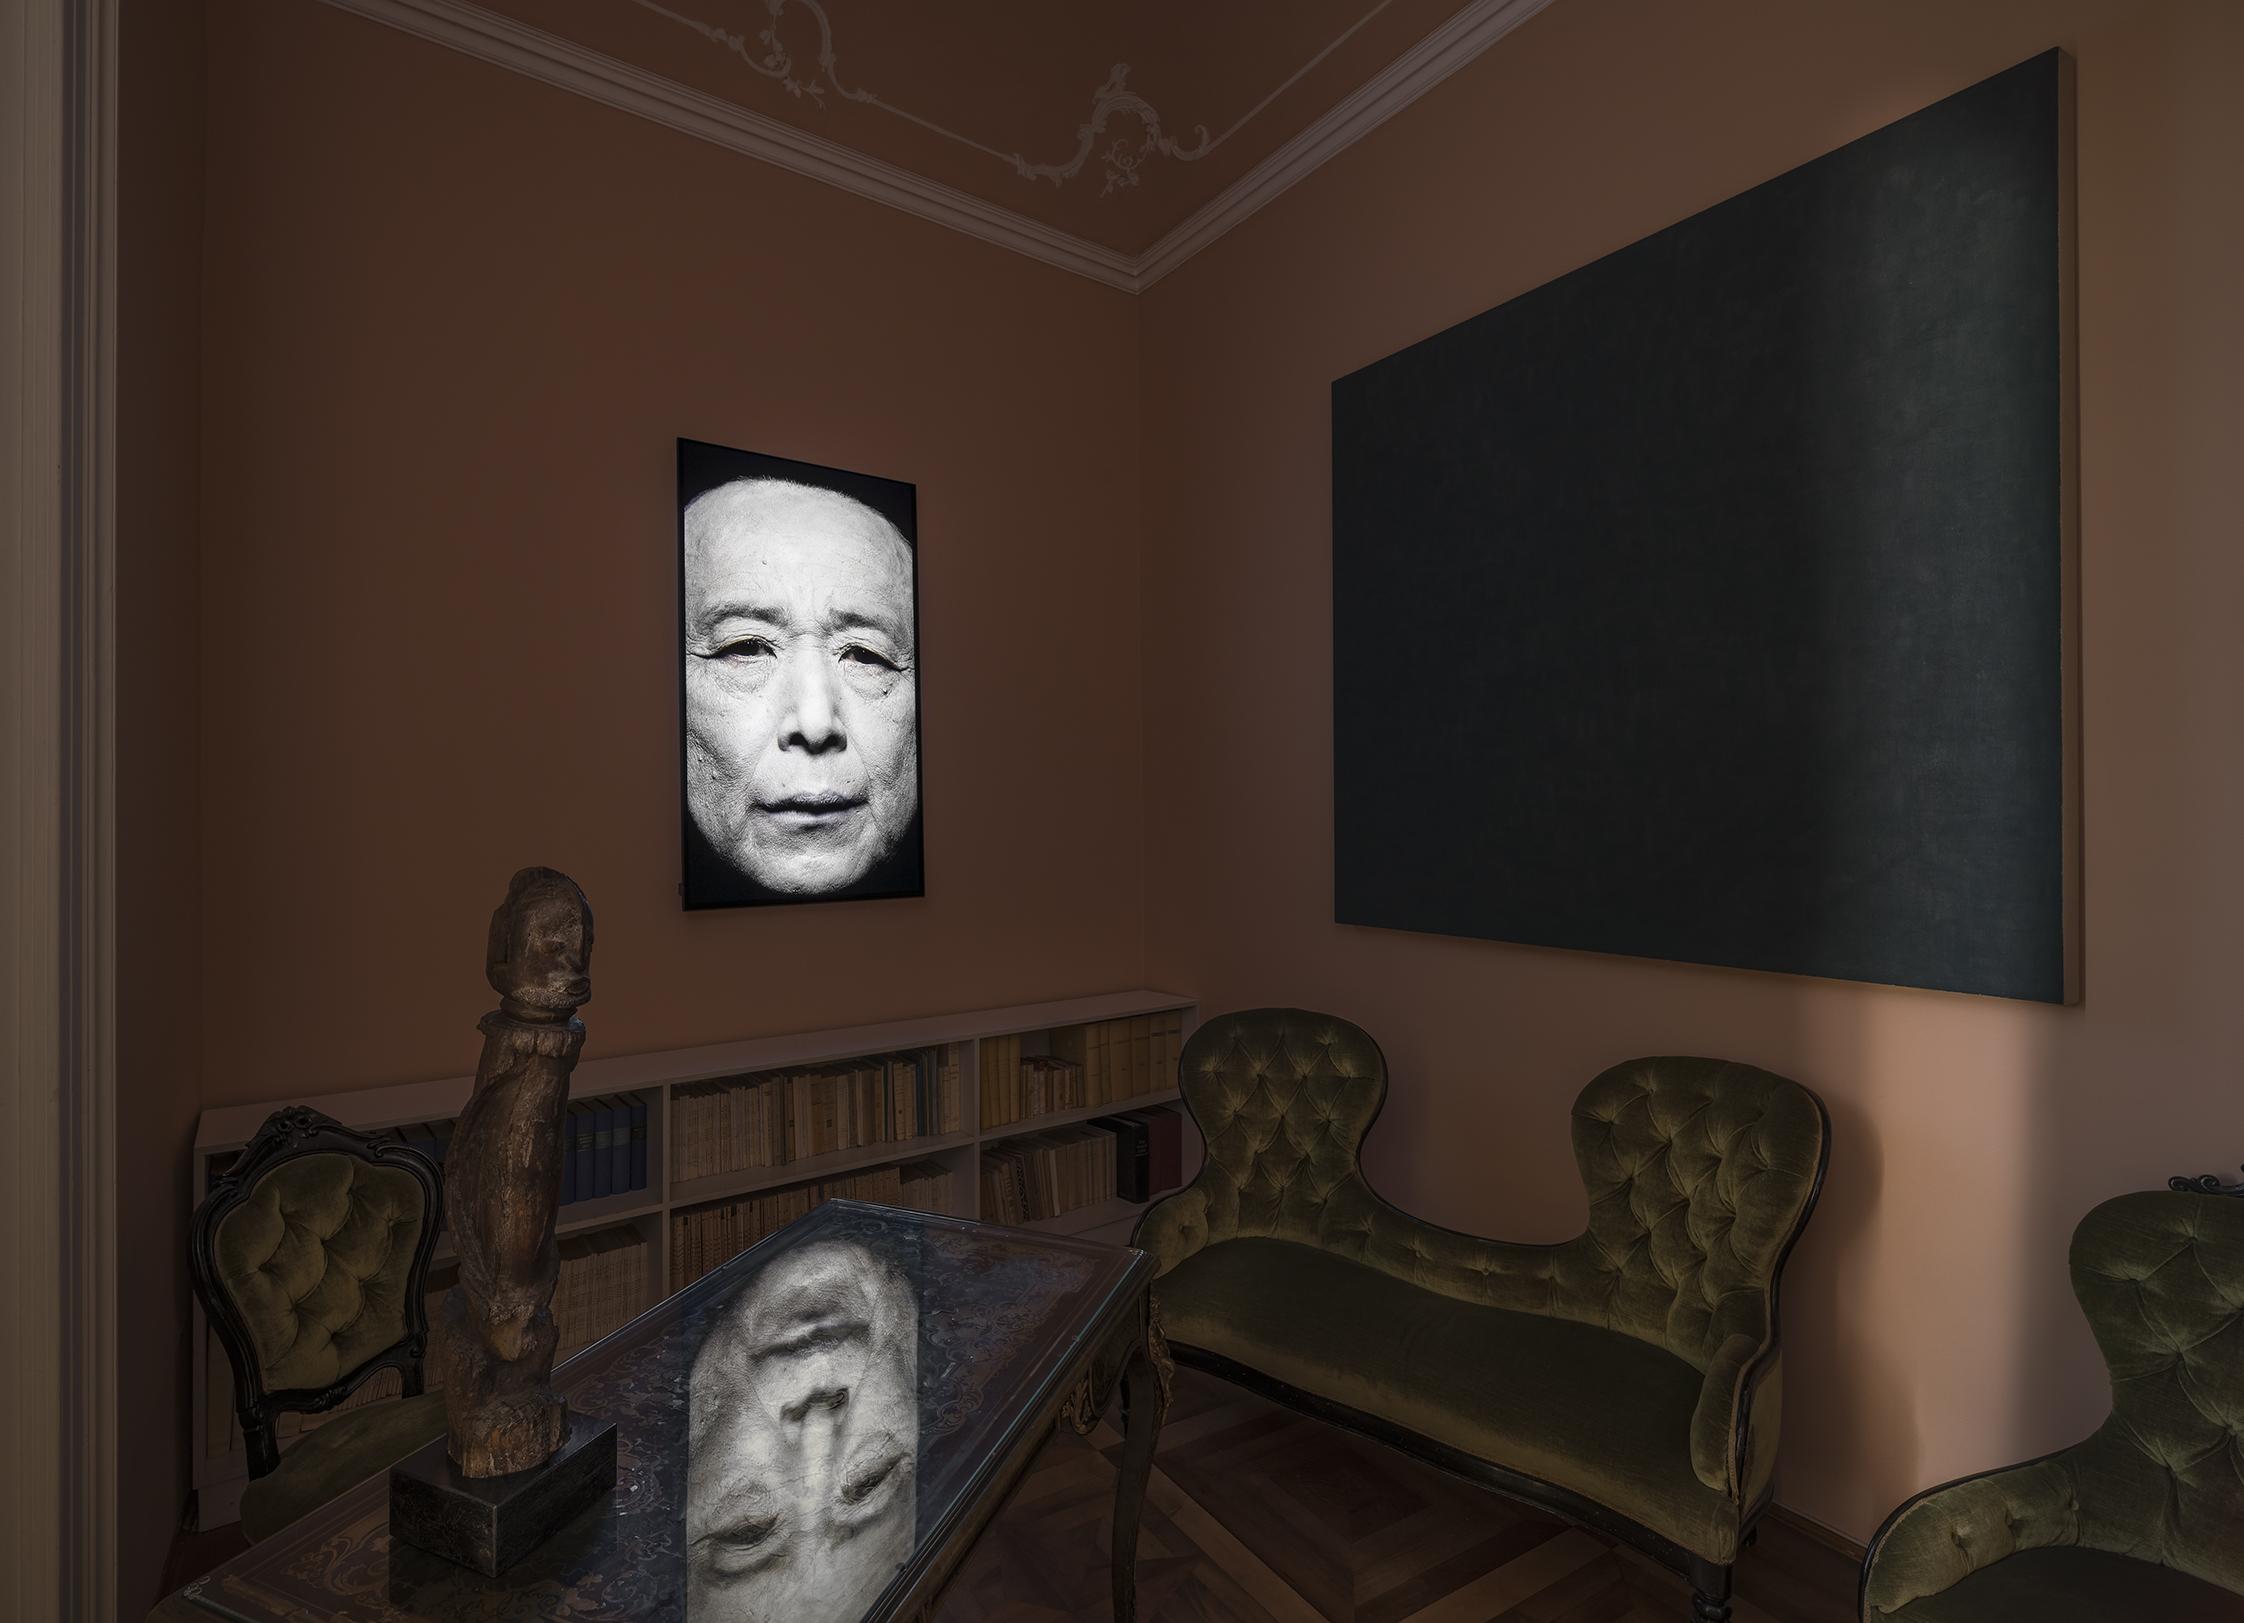 Robert Wilson, Gao Xingjian, Scrittore, 2005, Colonna sonora / Peter Cerone, ©RW Work